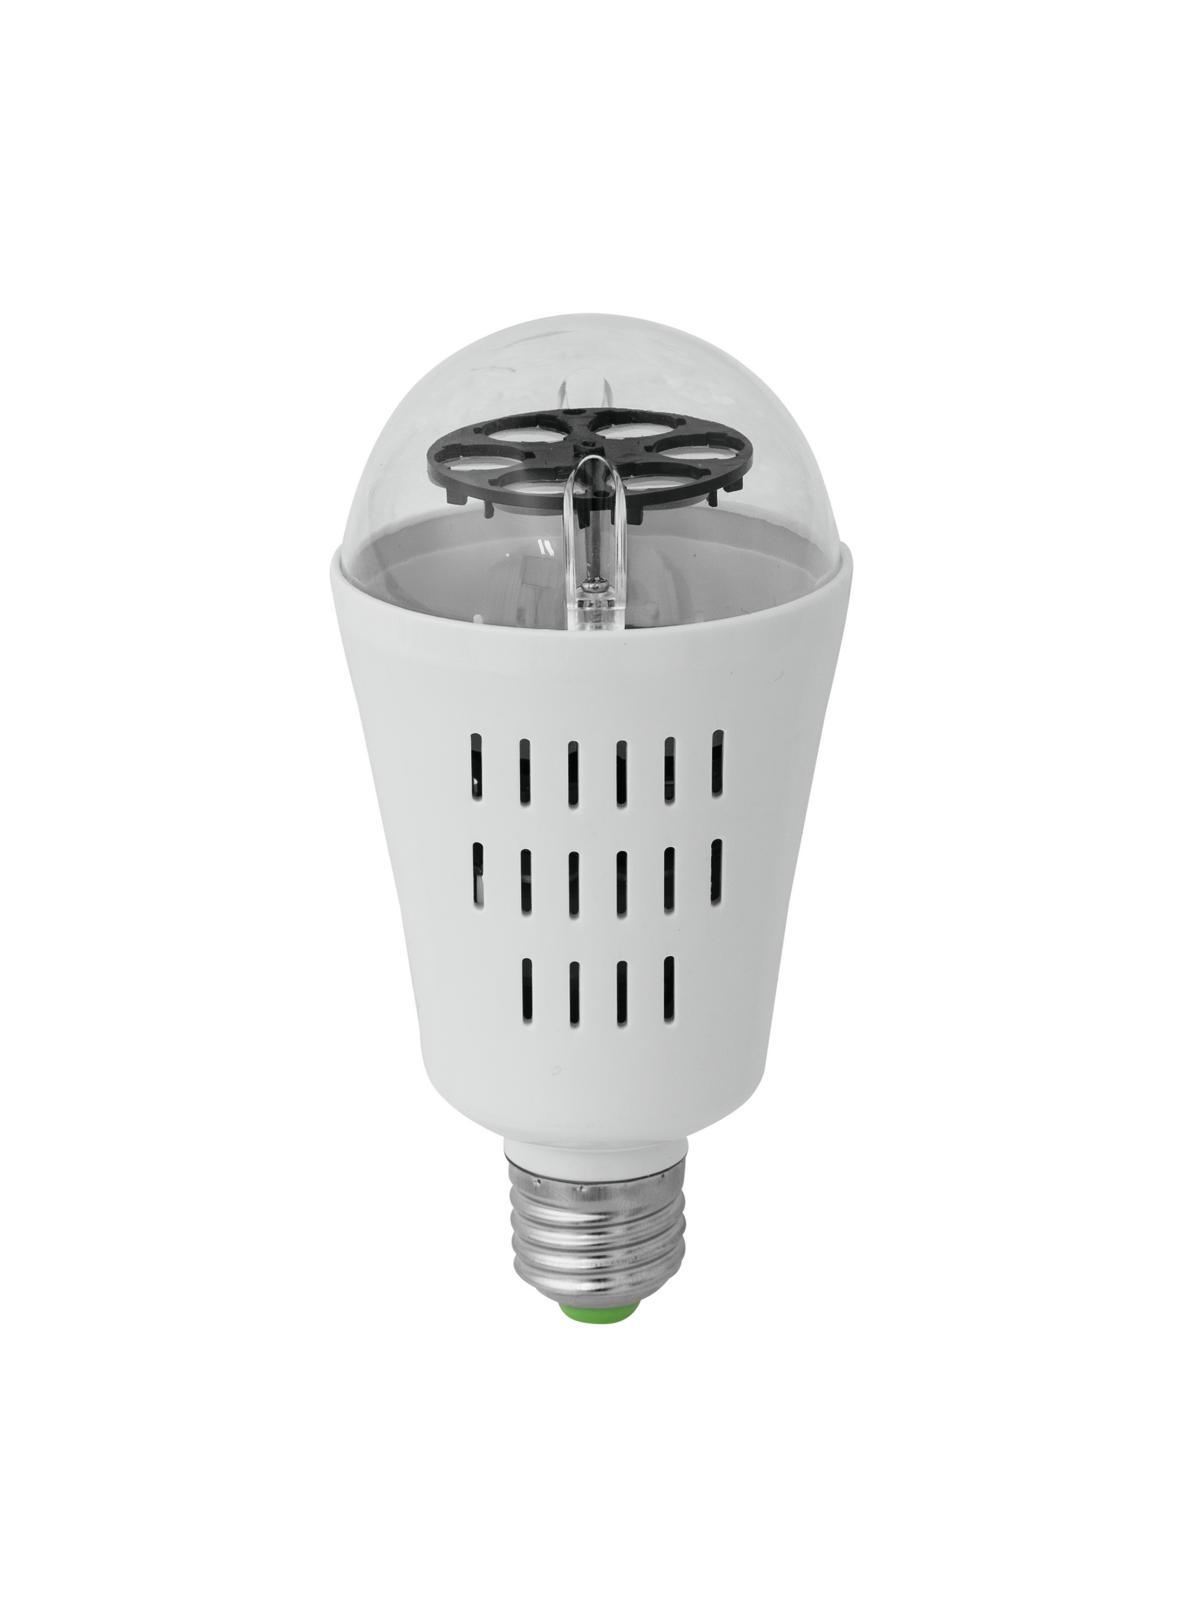 OMNILUX LED GM-1 E-27 Frühling